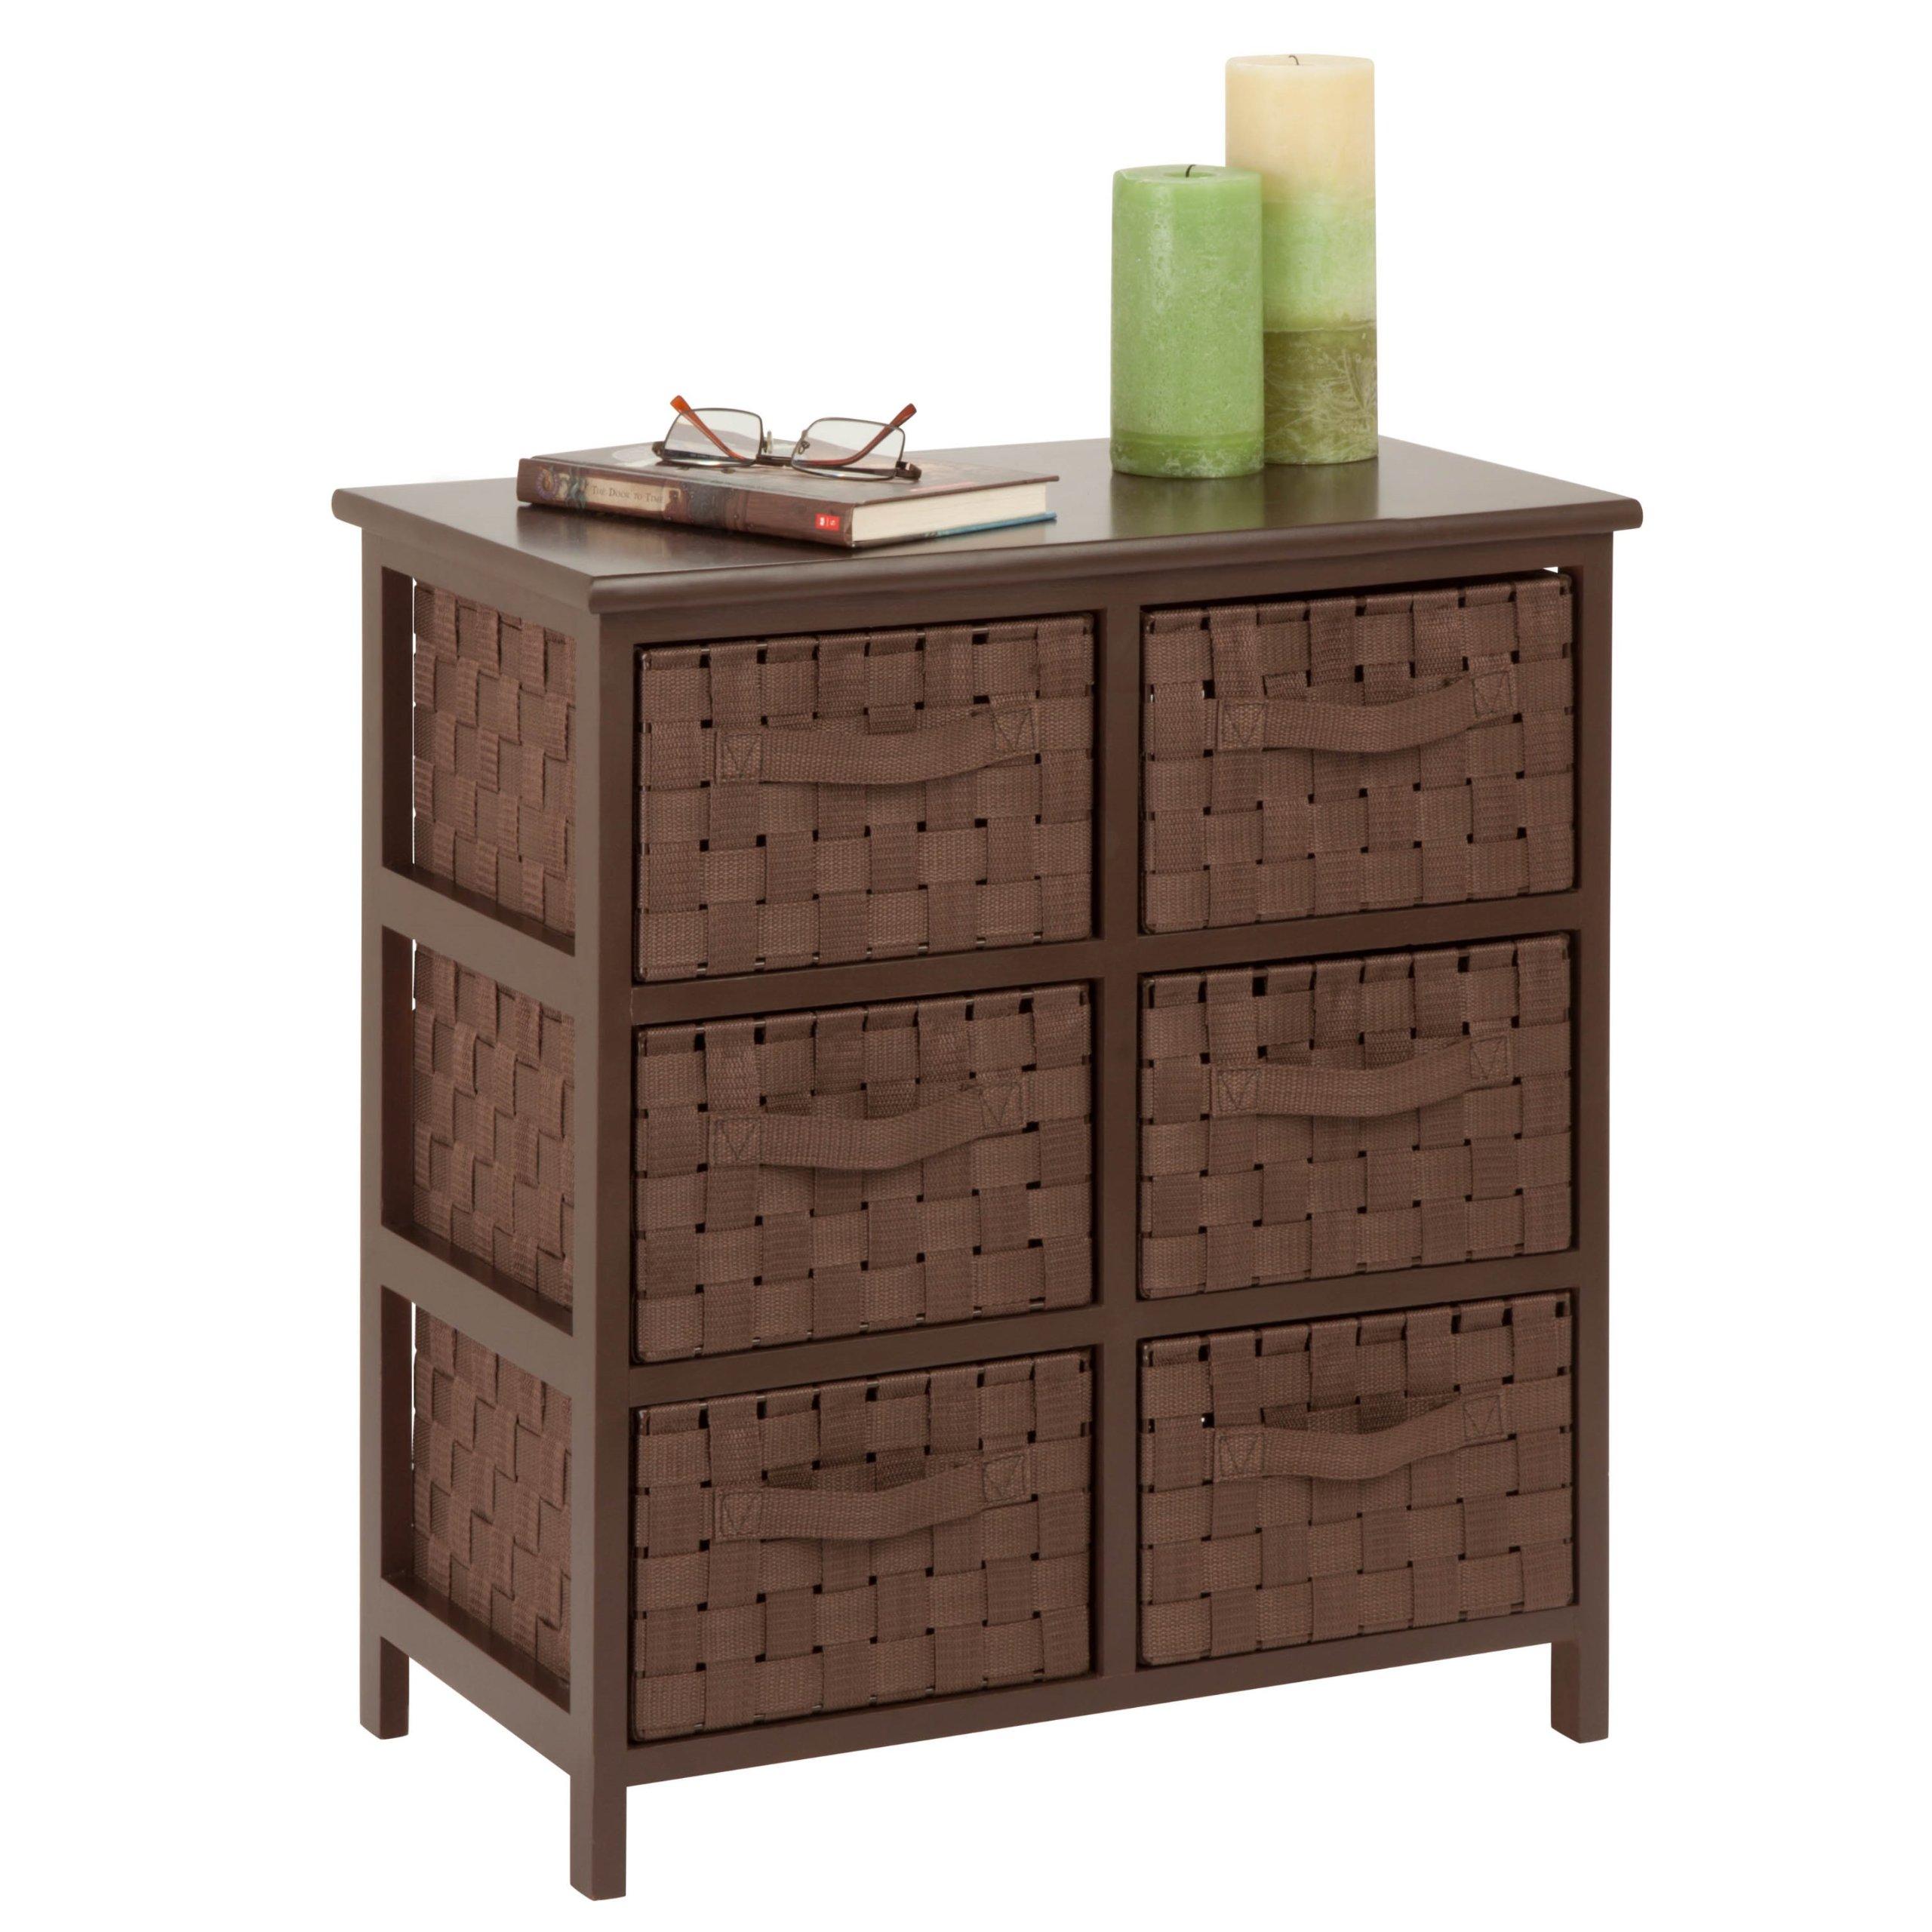 Storage Chest for Bathroom: Amazon.com